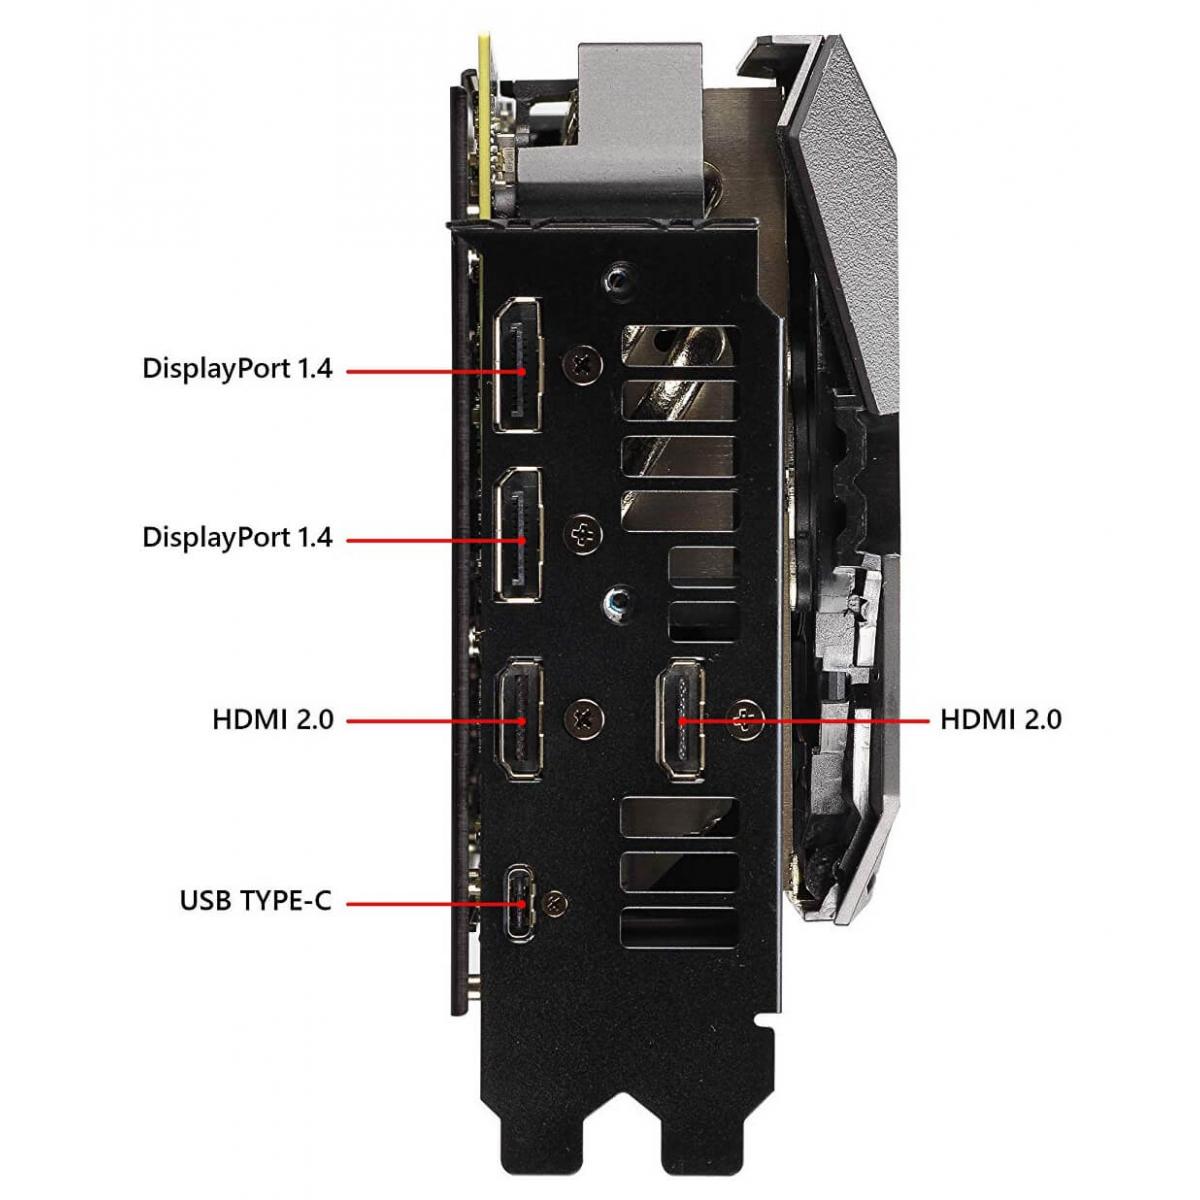 Placa de Vídeo Asus, Geforce, RTX 2080 Ti OC Rog Strix Gaming, 11GB, GDDR6, 352Bit, ROG-STRIX-RTX2080TI-O11G-GAMING